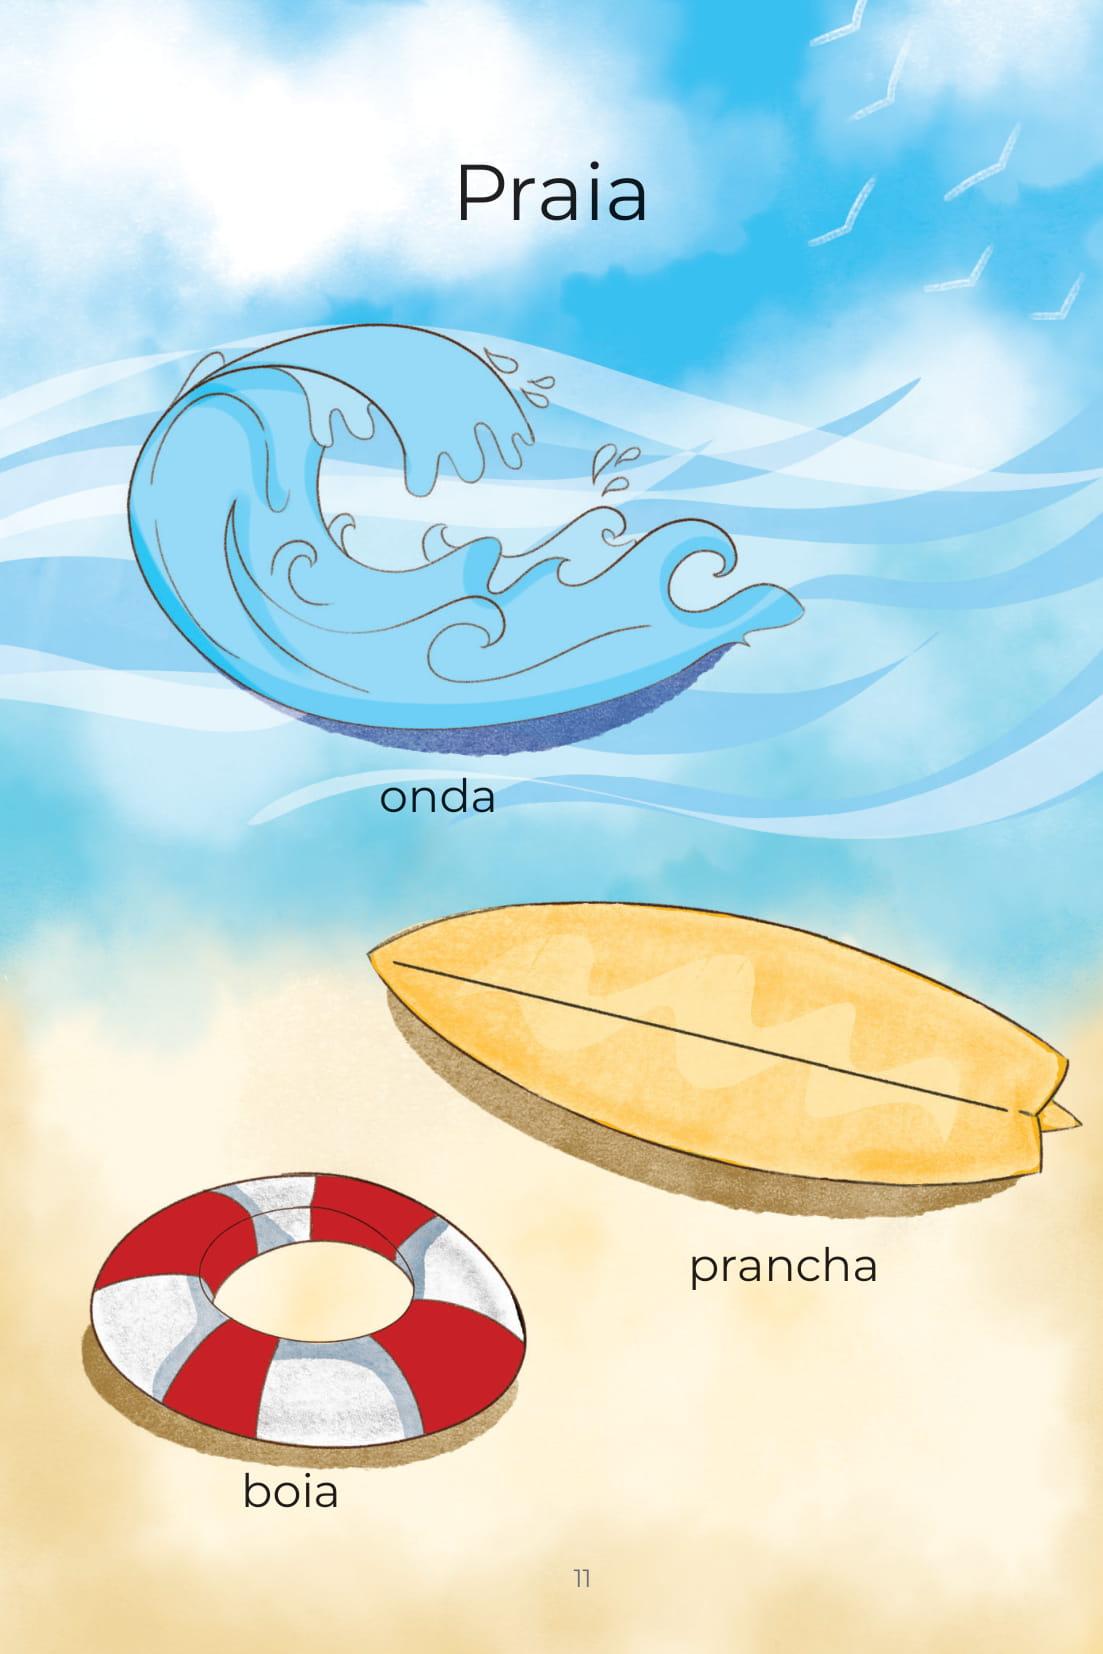 Praia onda prancha boia